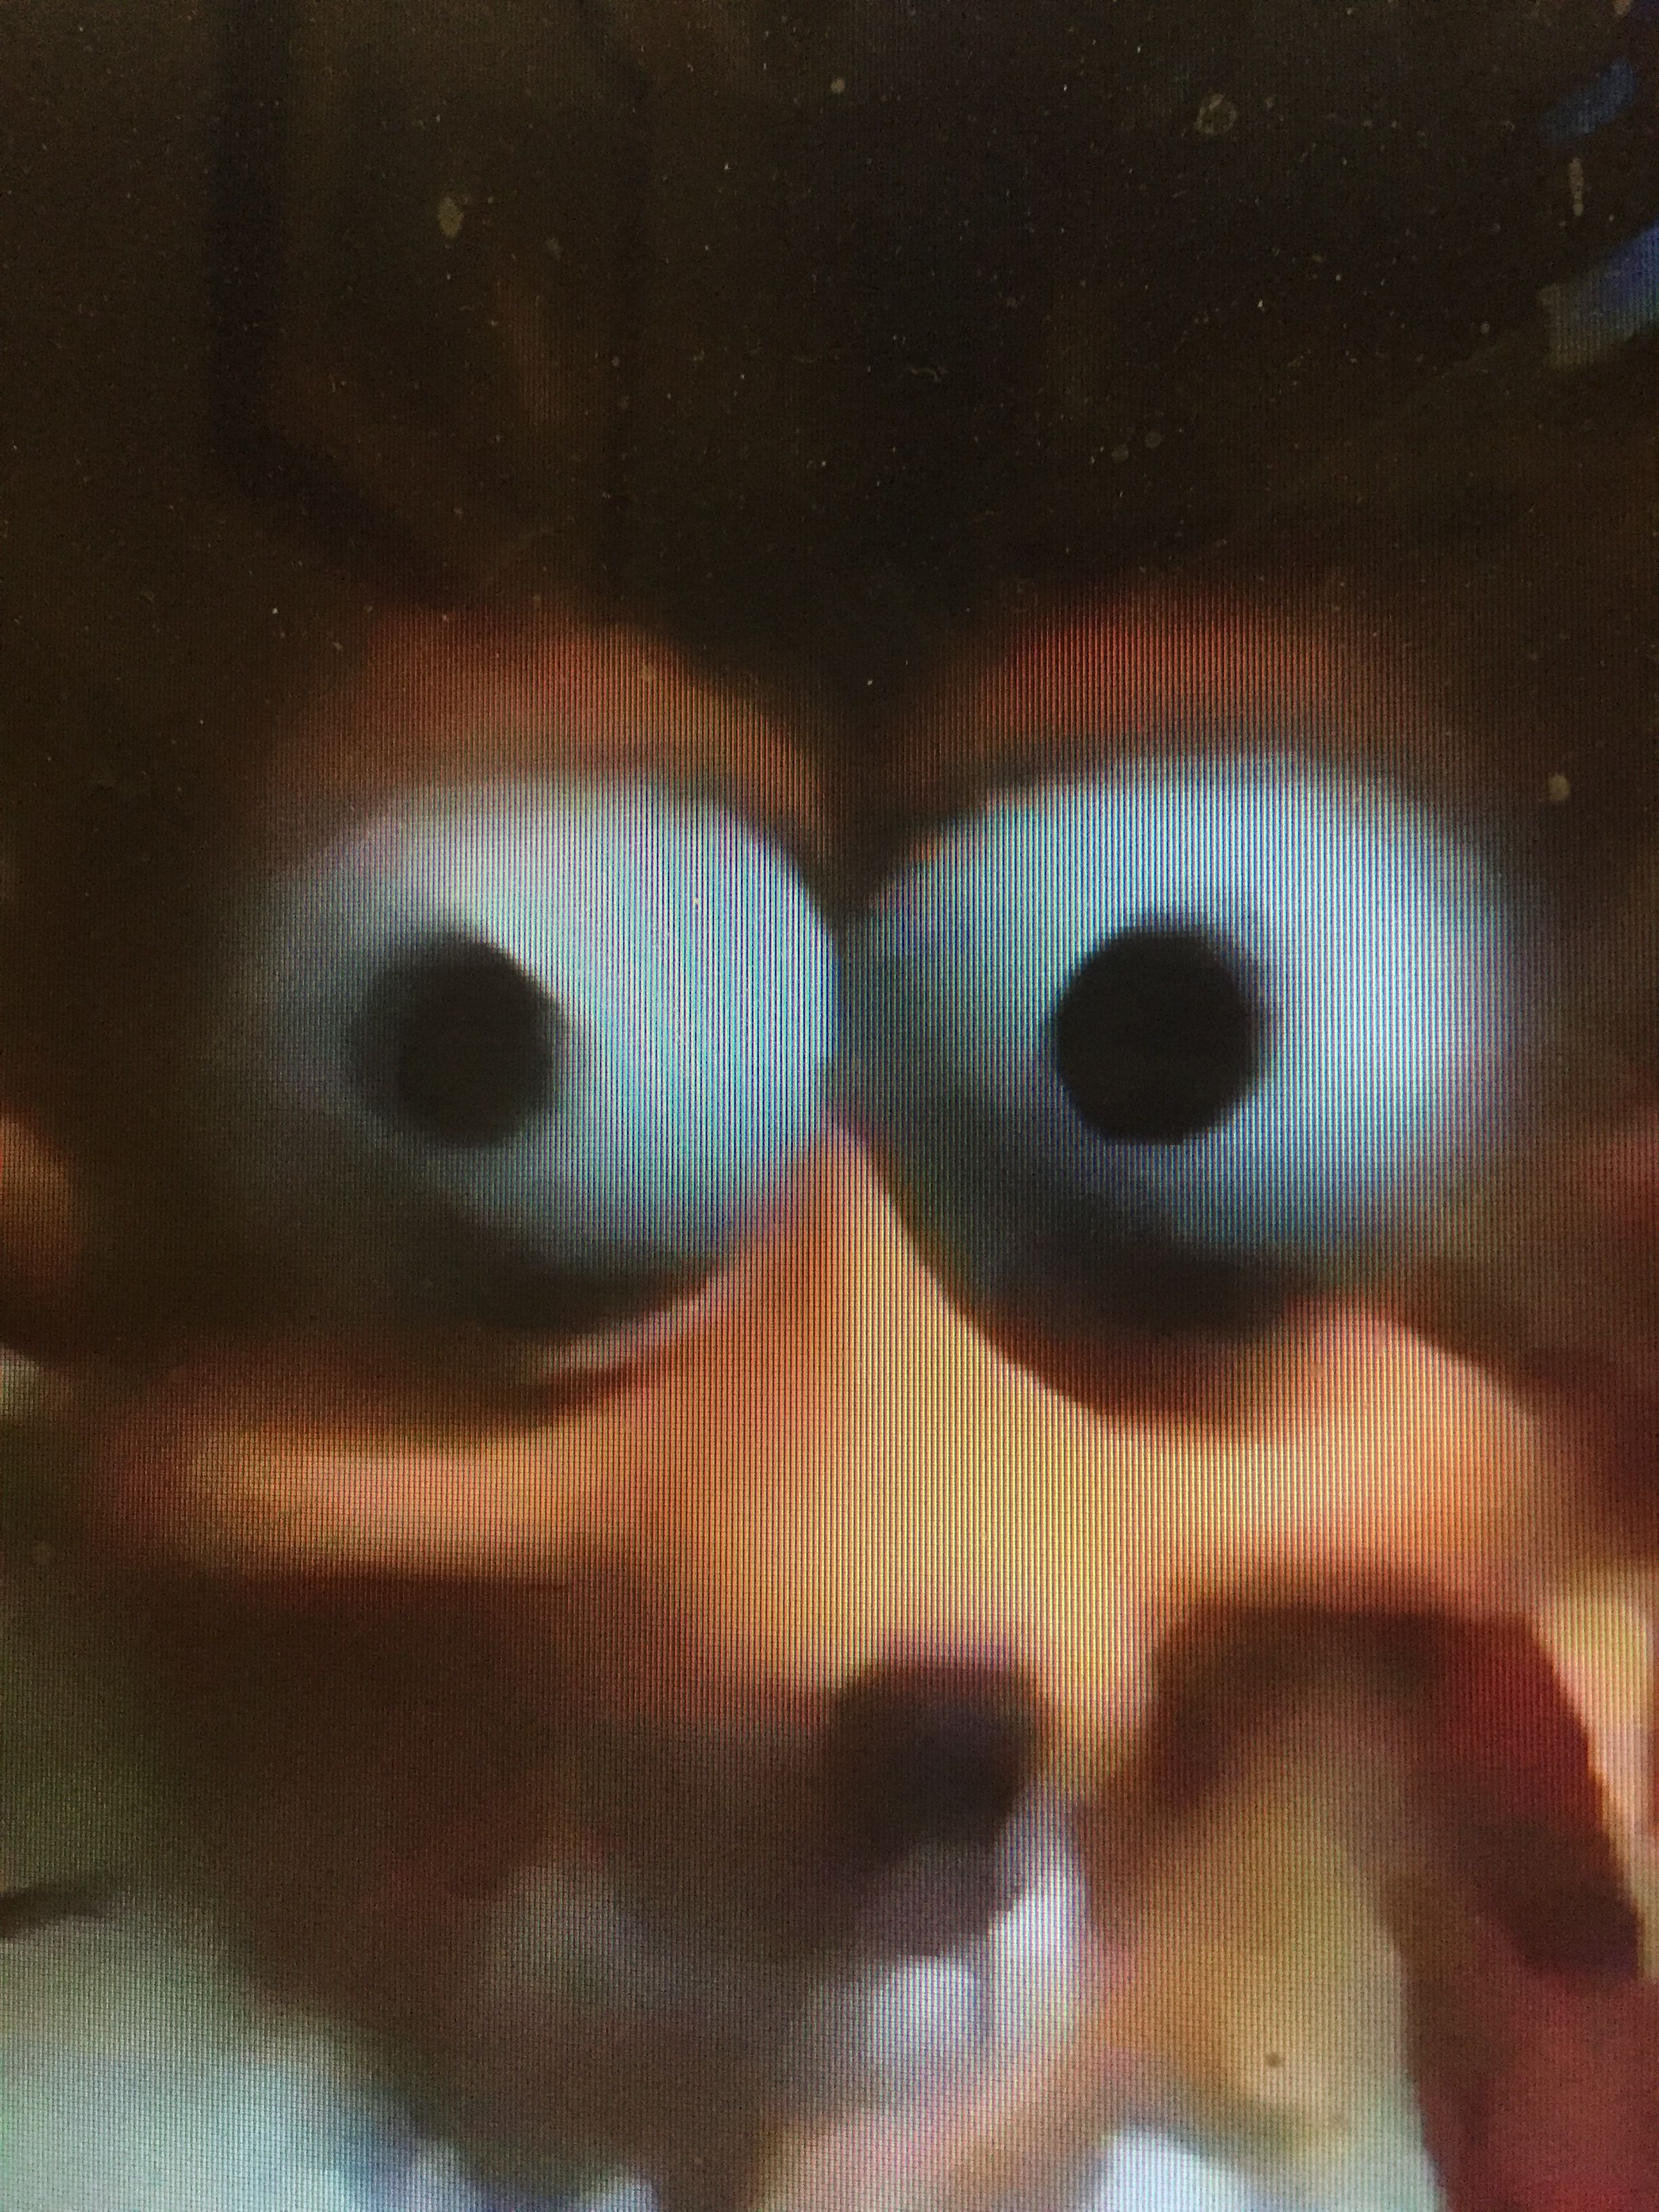 Yo Hello It Is Me Quality Memes Funny Memes Meme Faces